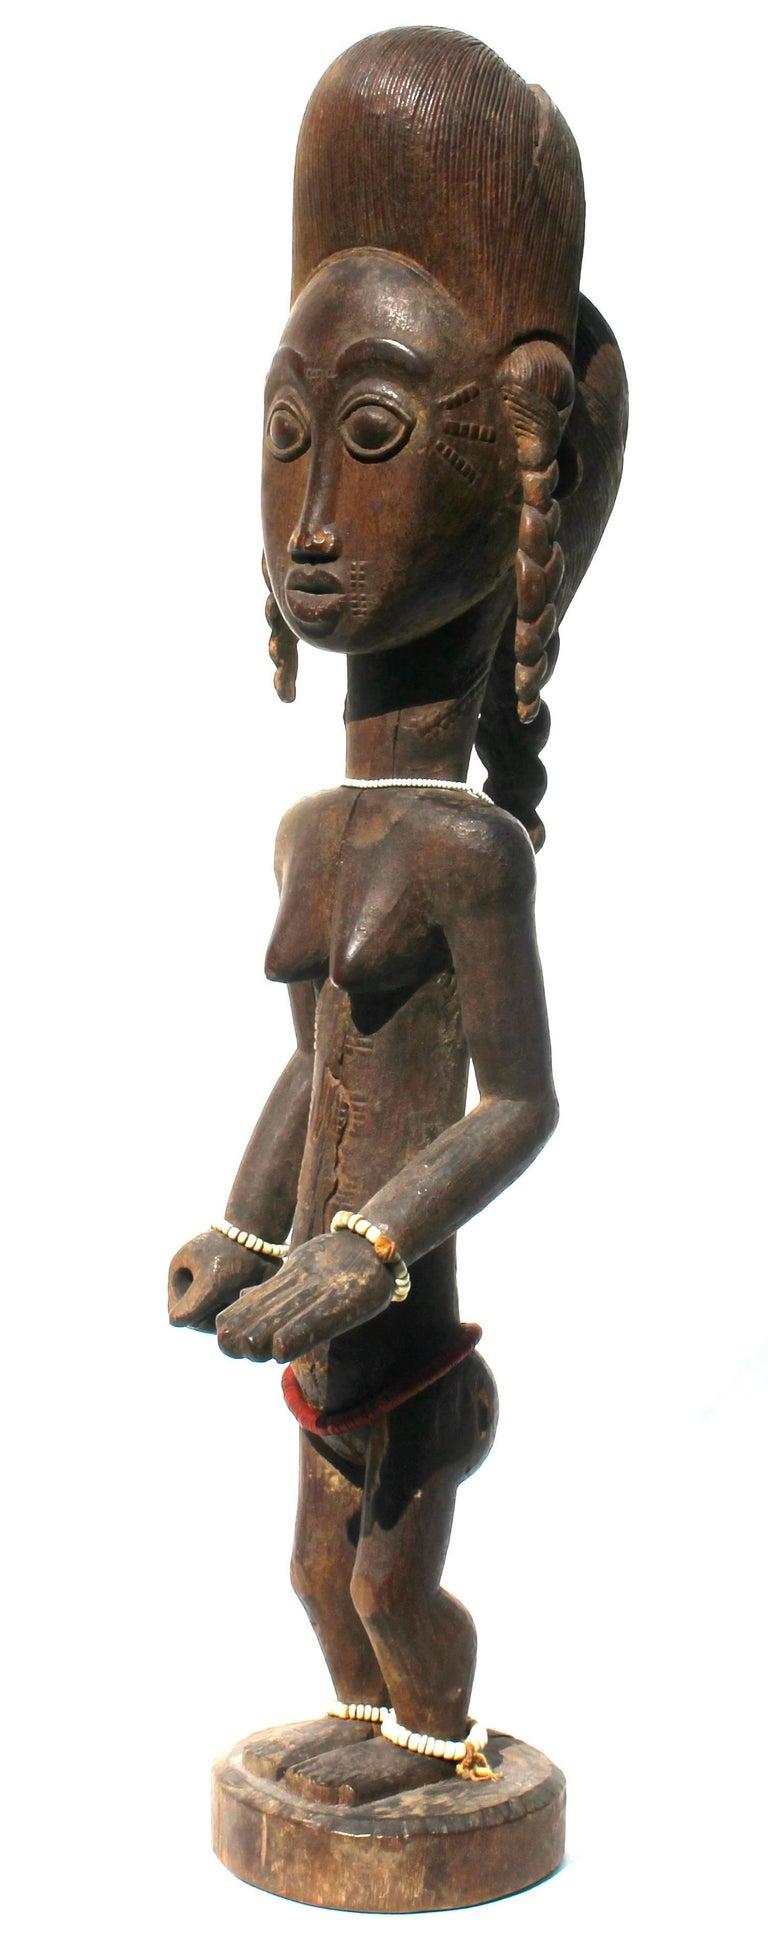 Tribal Baule Female Carved Wood Figure, African Sculpture Sotheby's Provenance For Sale